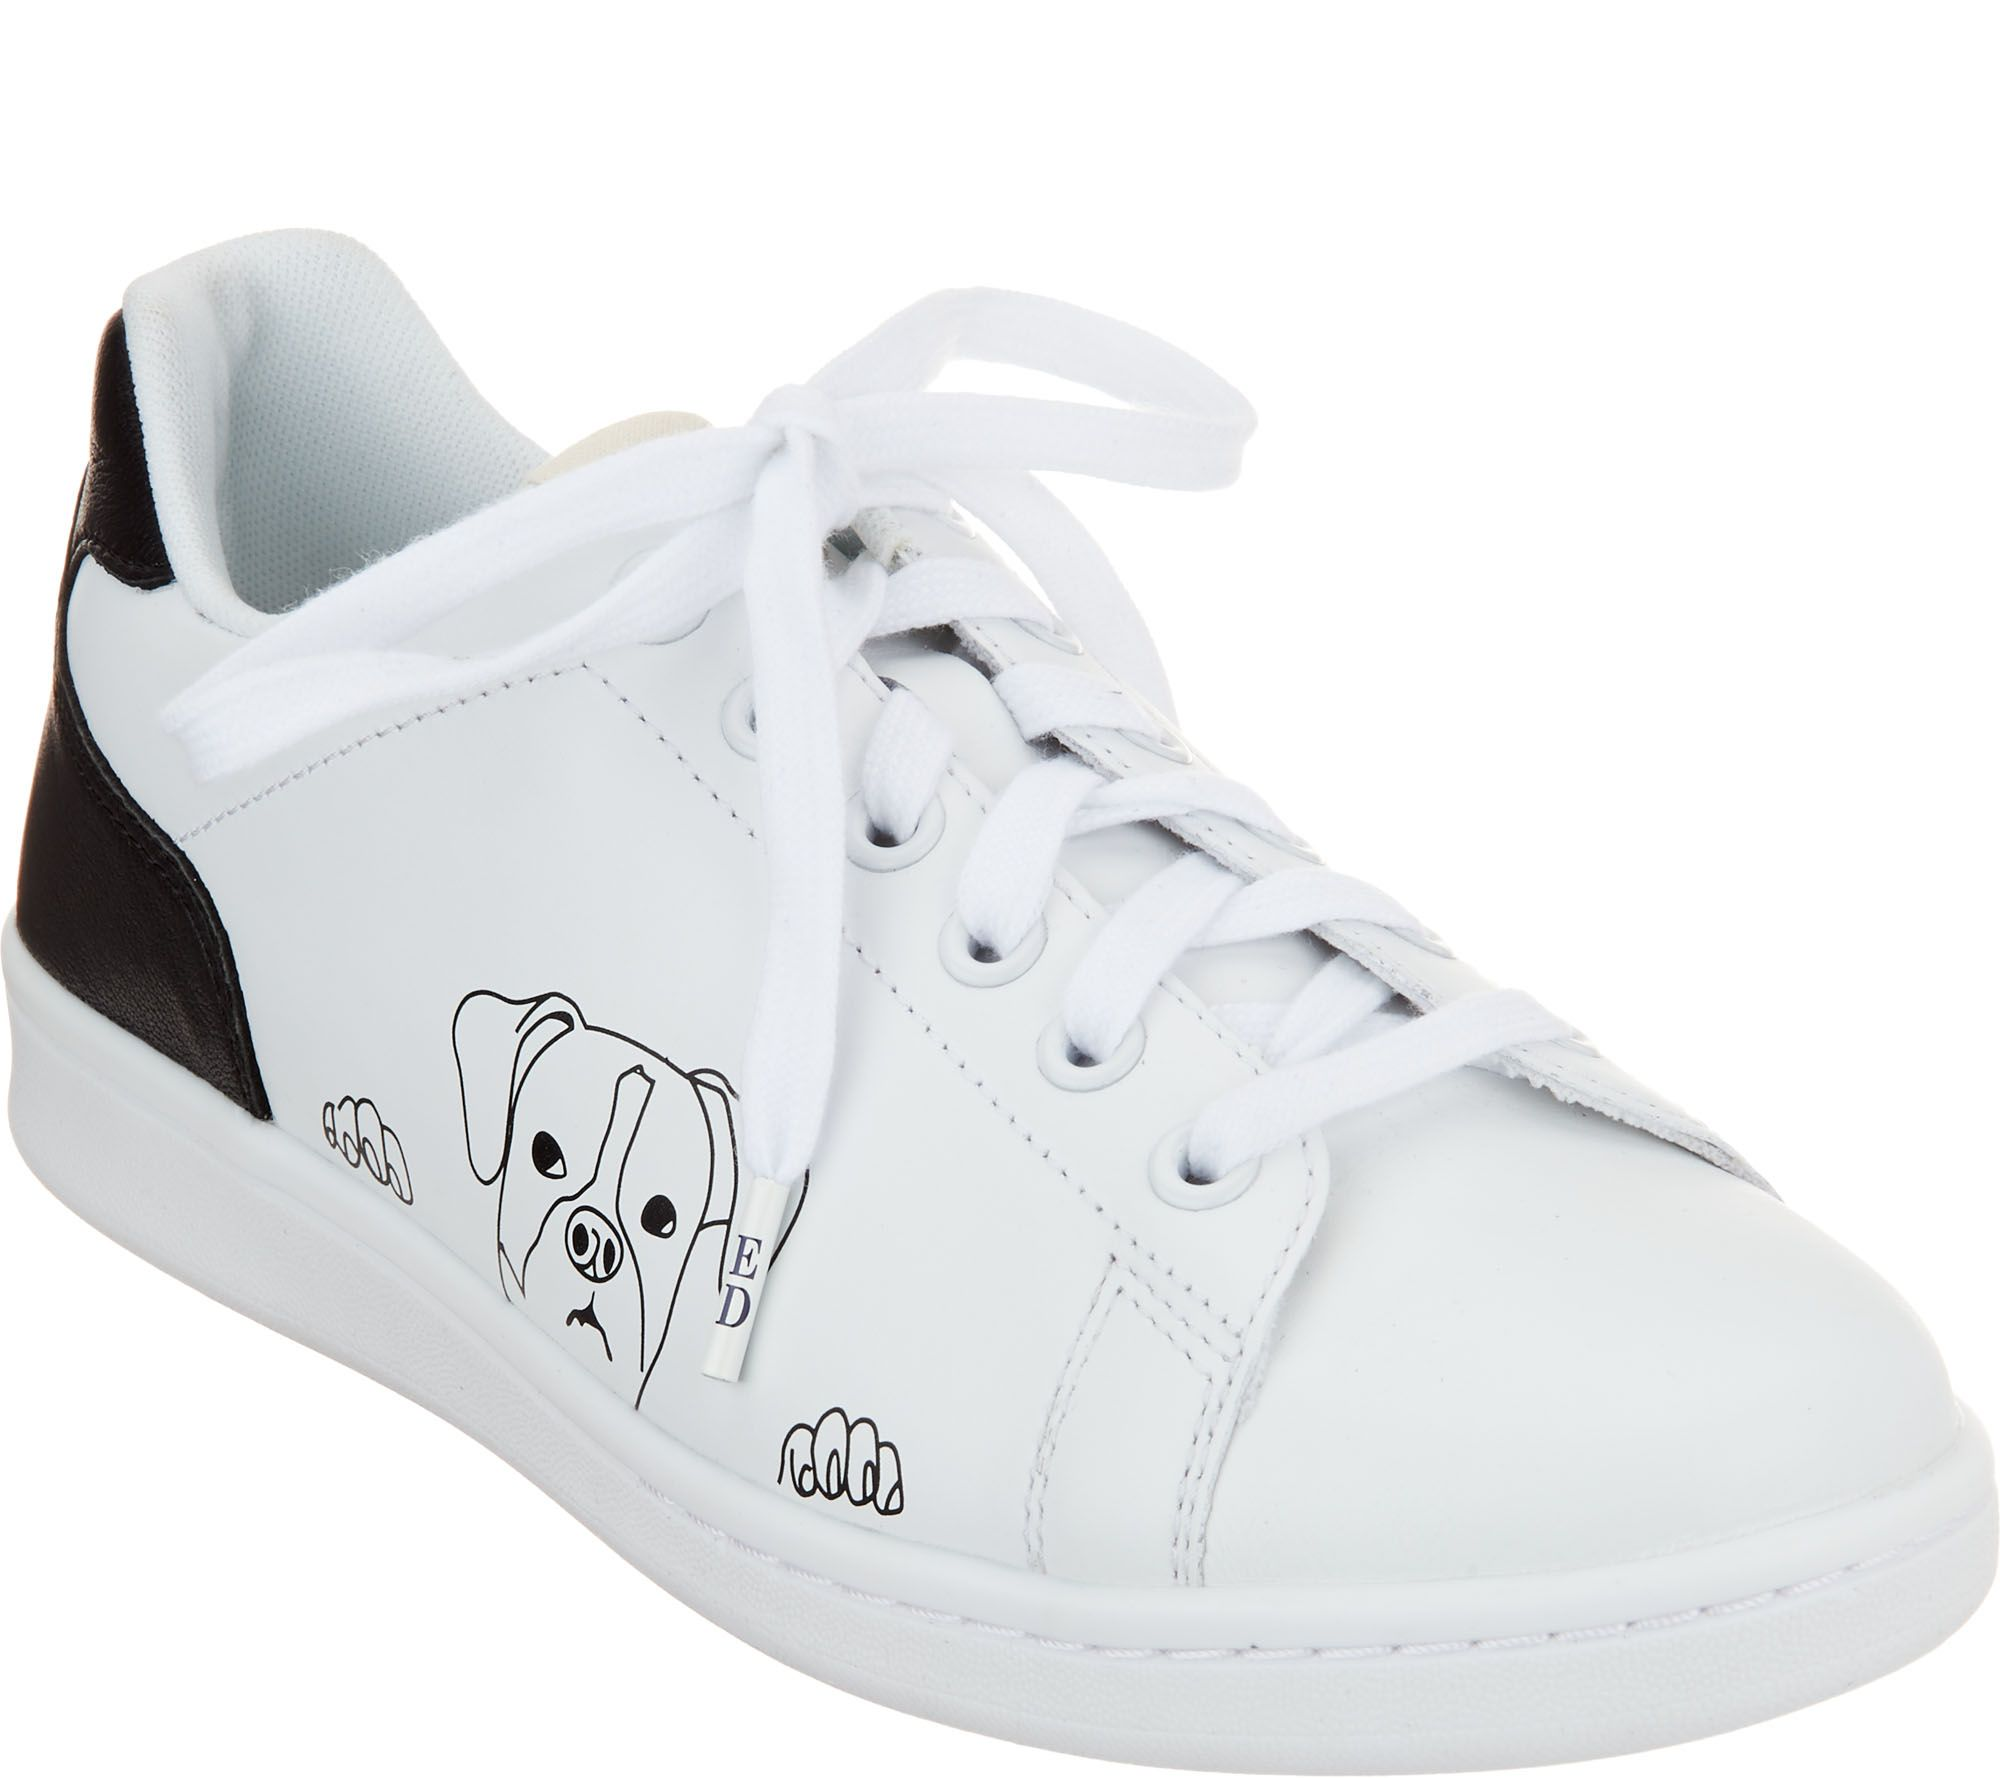 ee83f1cde93cbf ED Ellen DeGeneres Leather Graphic Sneakers - Chapanima - Page 1 — QVC.com